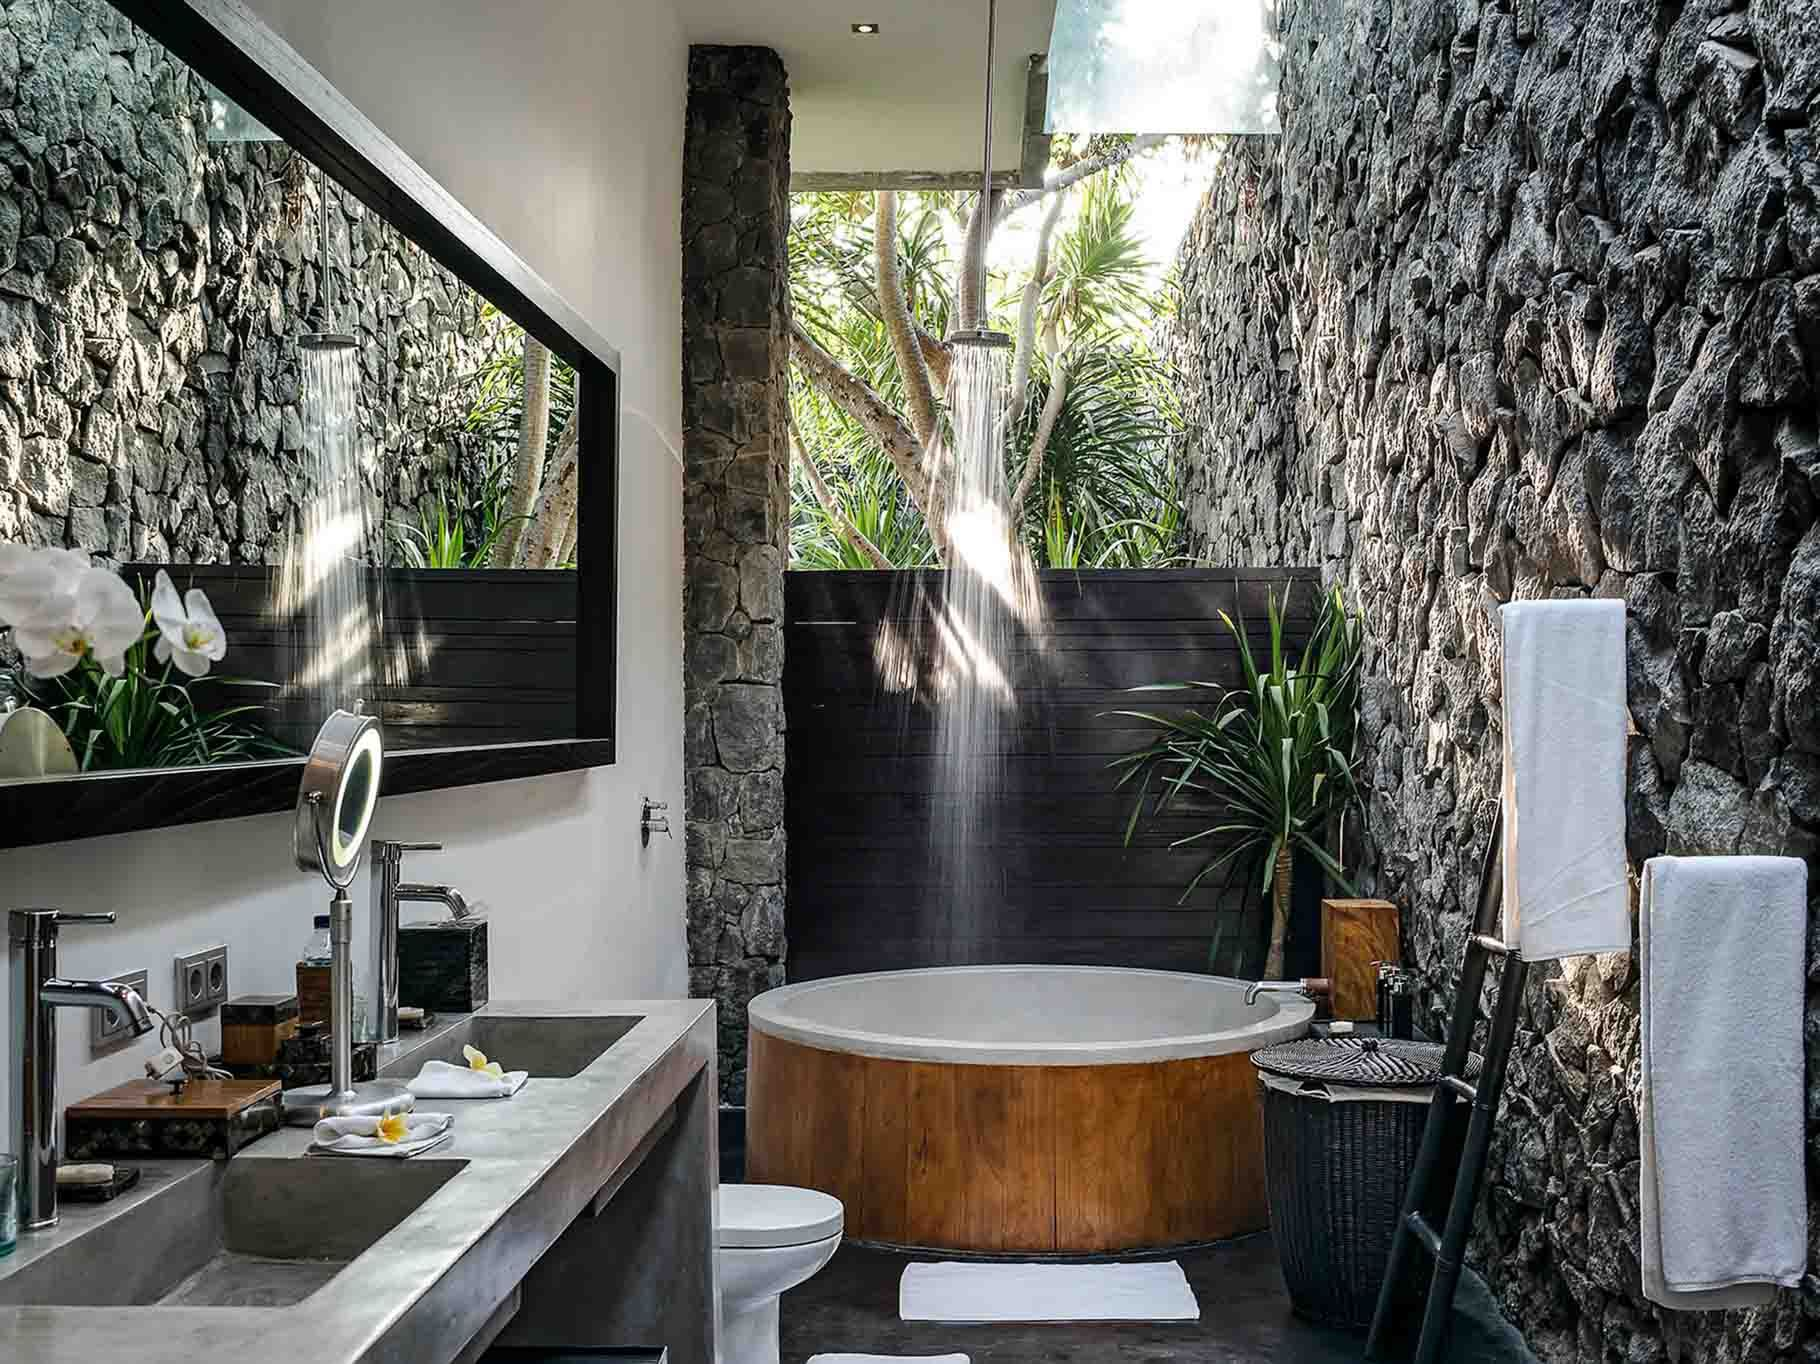 Villa Mana Affittabali Com Villas And Apartments For Rental In Bali Seminyak Kuta Canggu Ubud Outdoor Bathroom Design Outdoor Bathrooms Bali House Bali bathroom design ideas